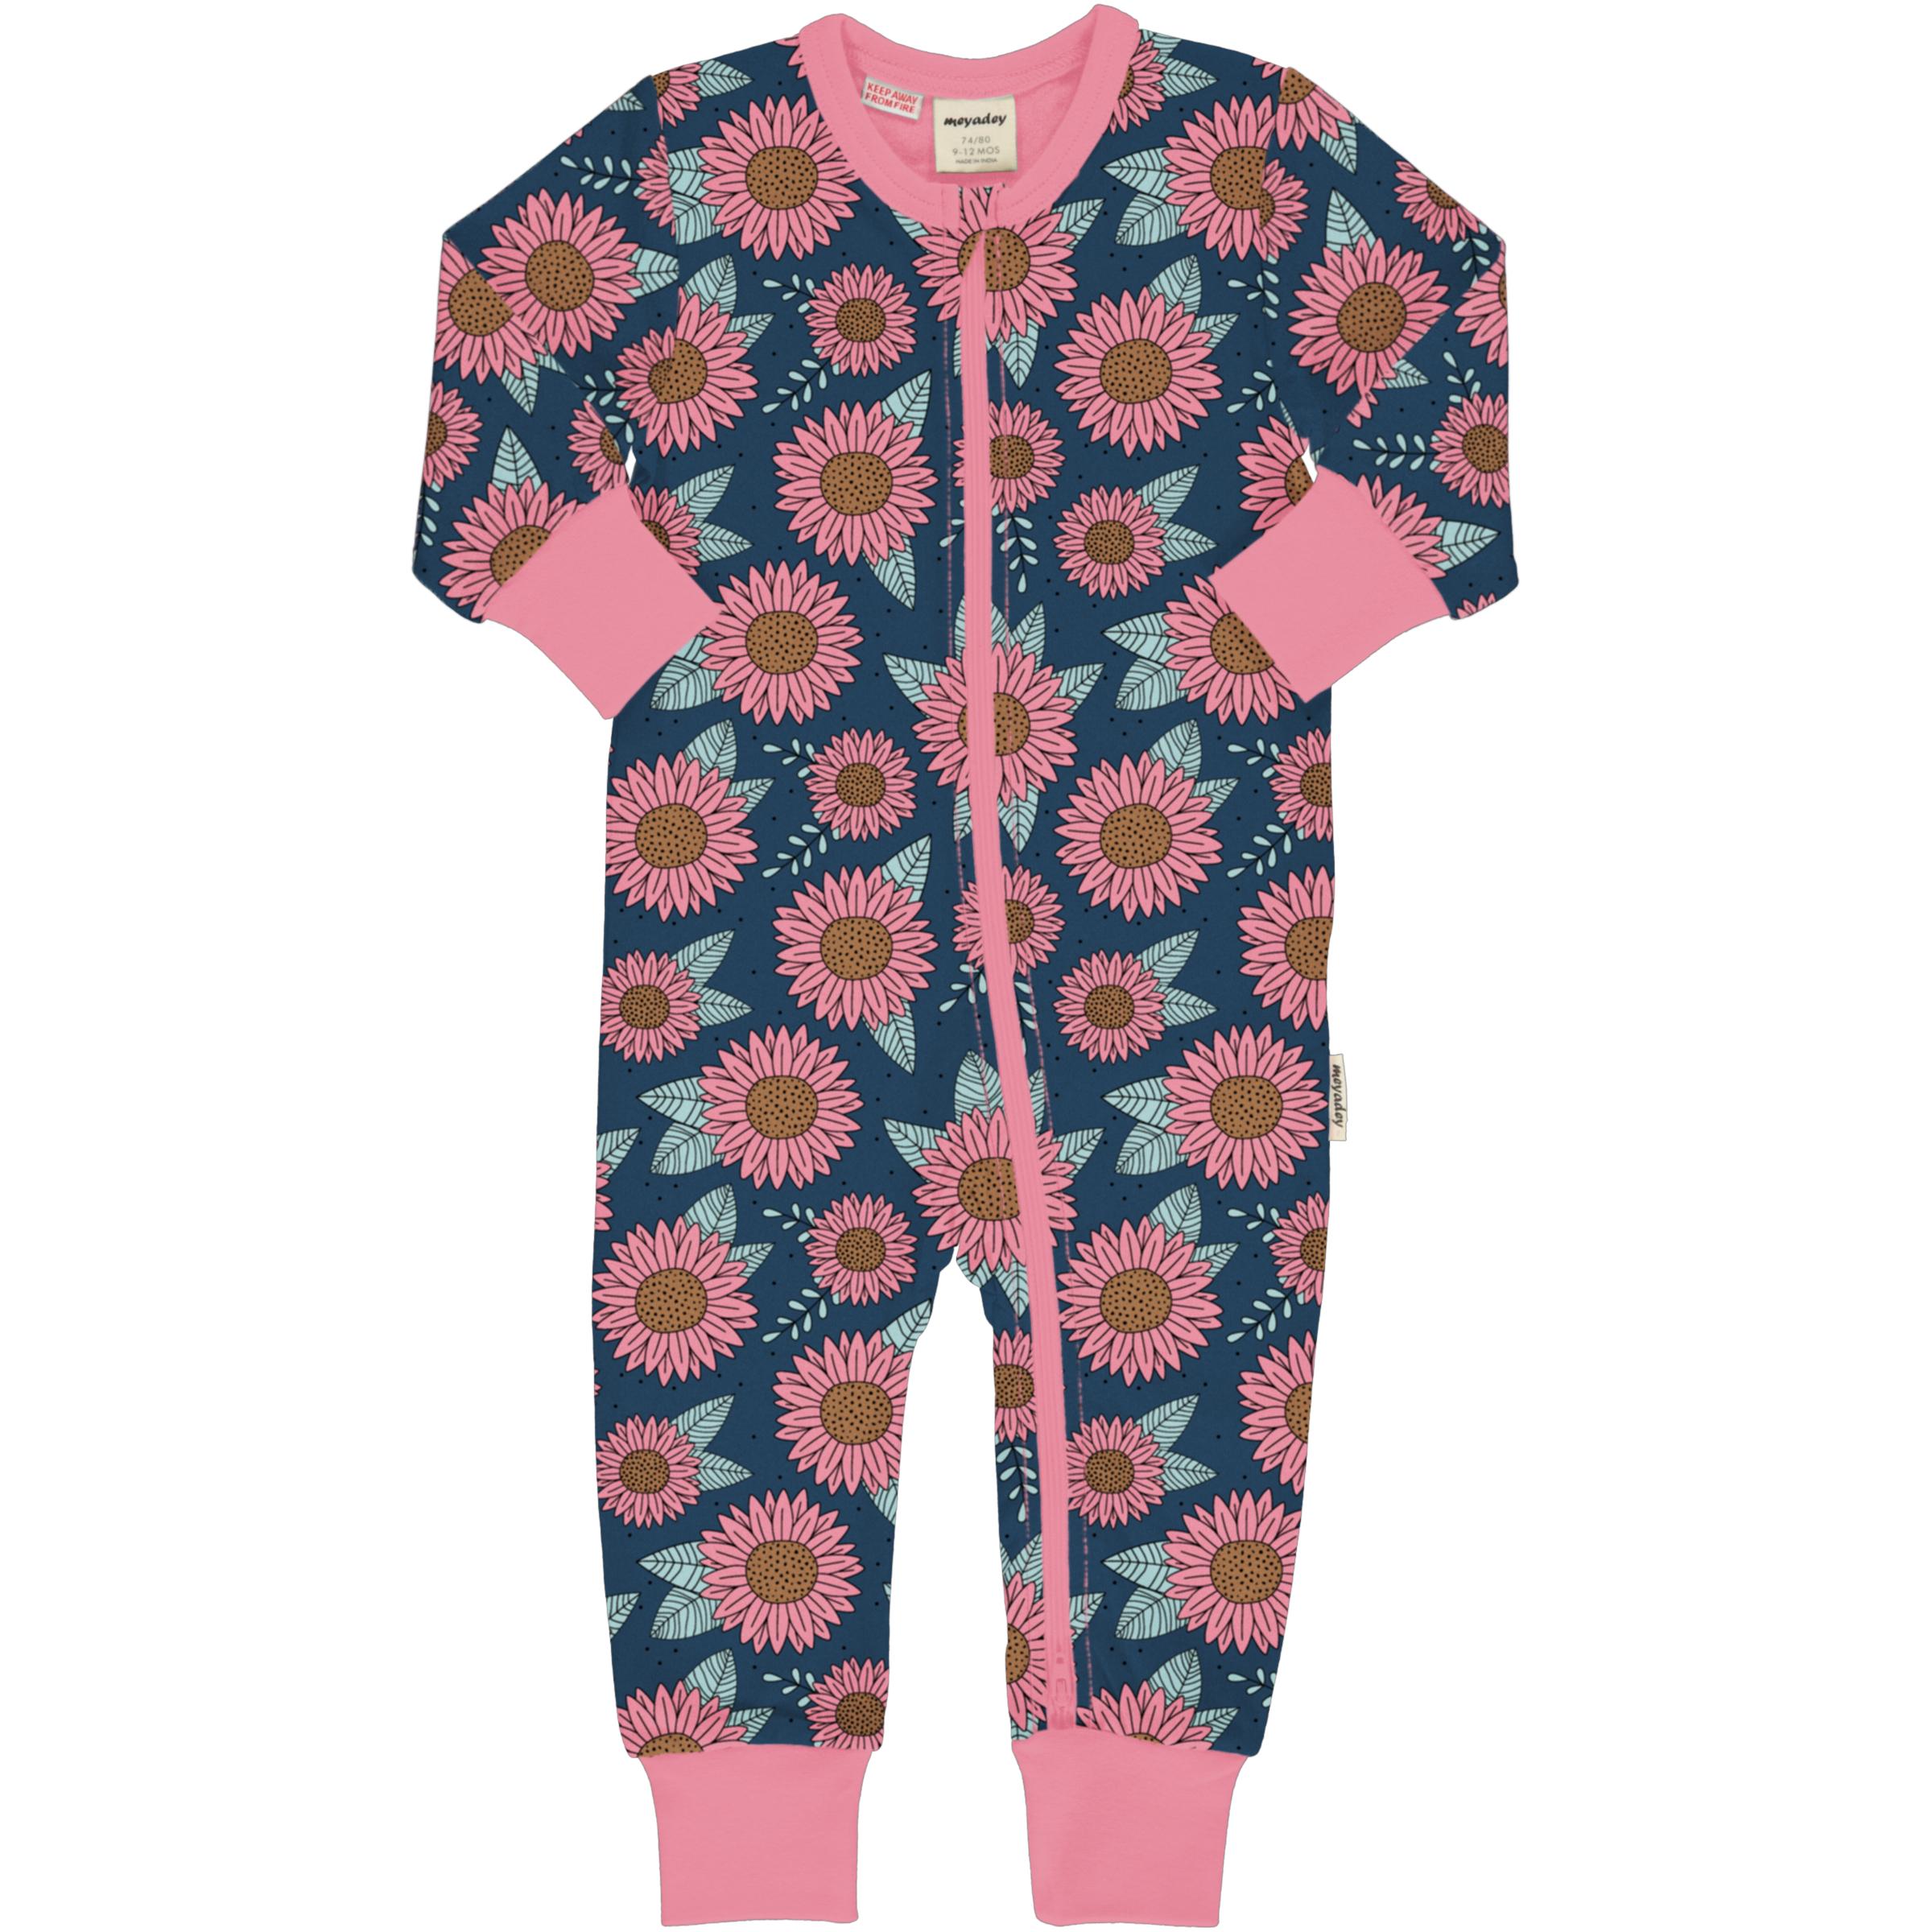 Meyadey by Maxomorra Baby Schlafanzug Einteiler Lang SUNFLOWER DREAMS 062/068